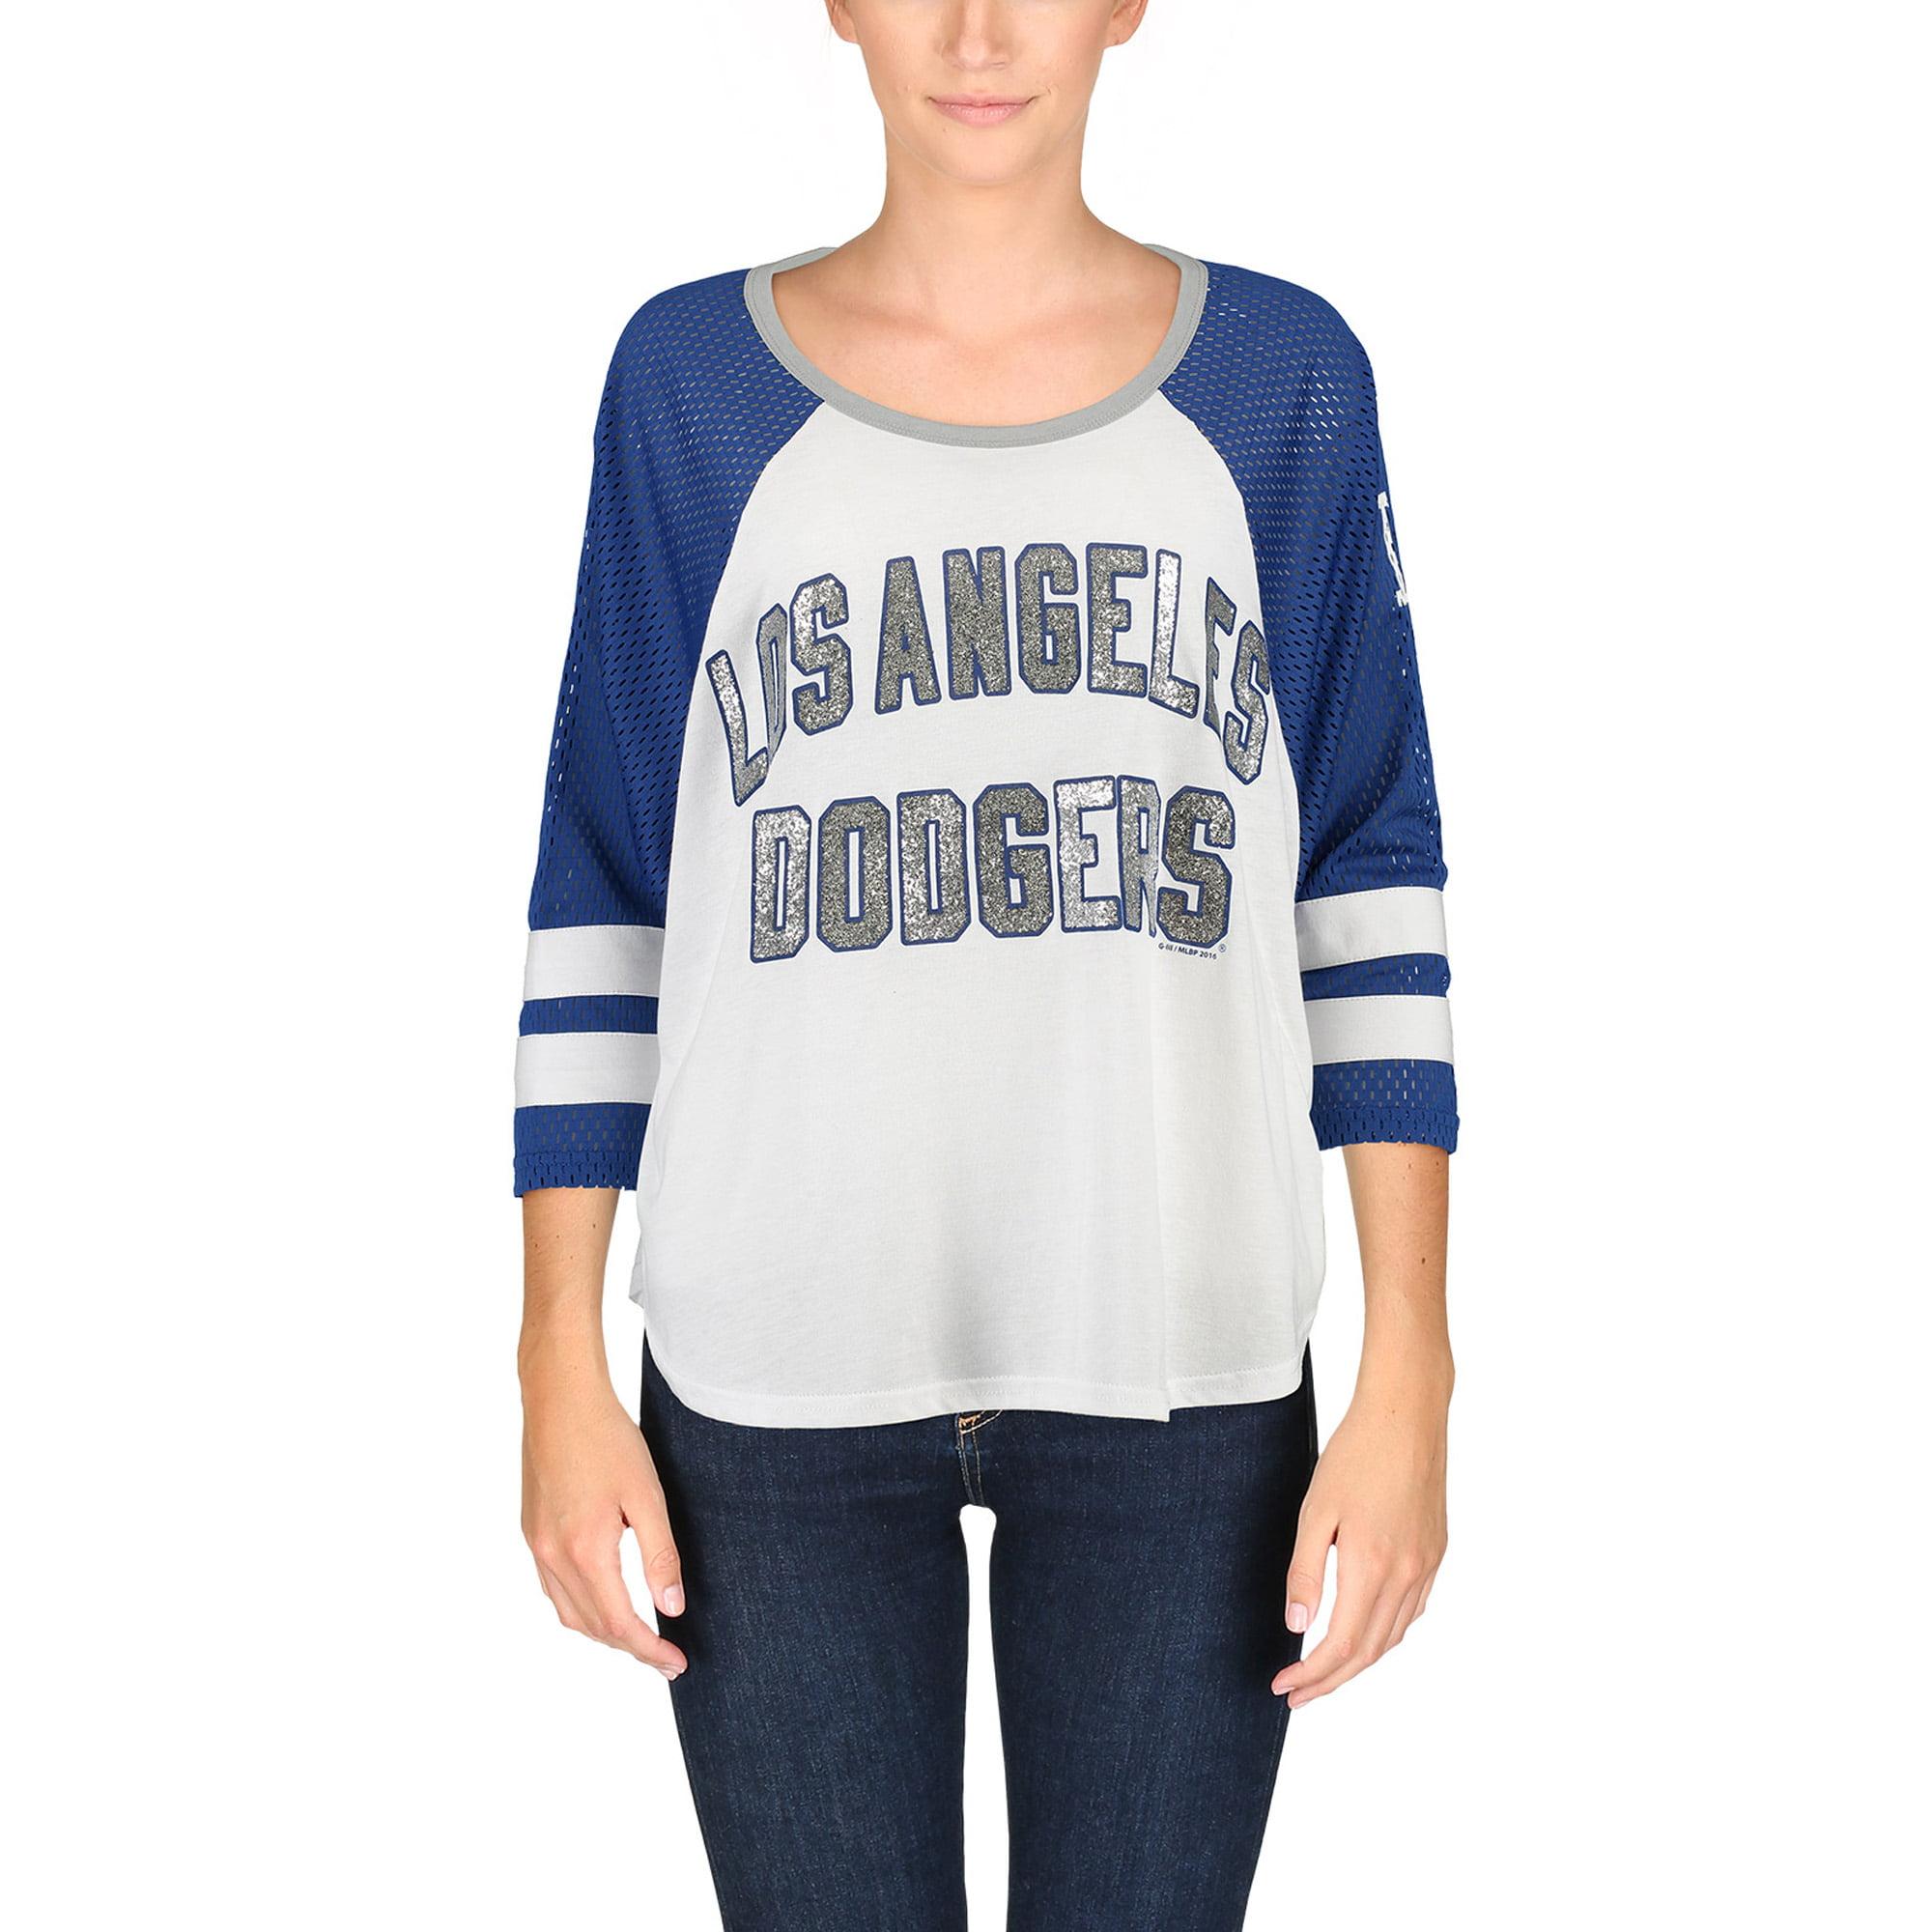 Los Angeles Dodgers G-III 4Her by Carl Banks Women's Grand Slam Tri-Blend Three-Quarter Sleeve T-Shirt - White/Royal